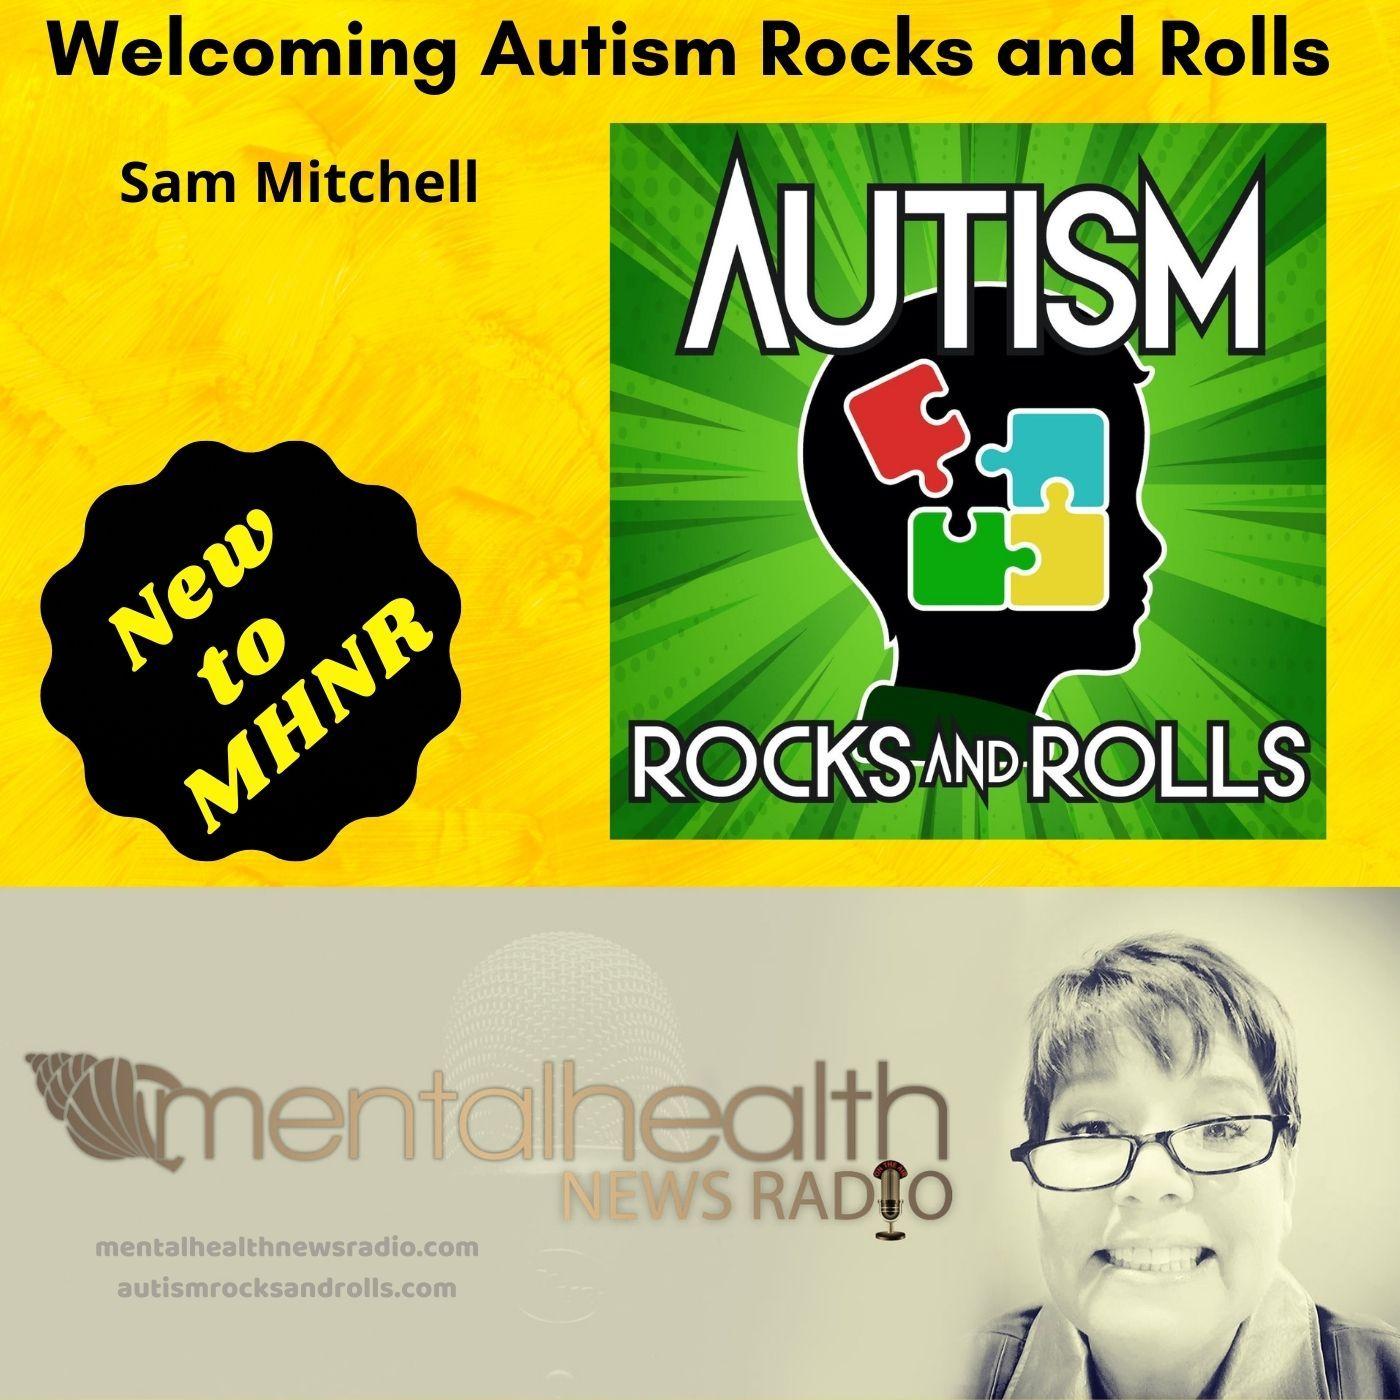 Mental Health News Radio - Welcoming Autism Rocks and Rolls